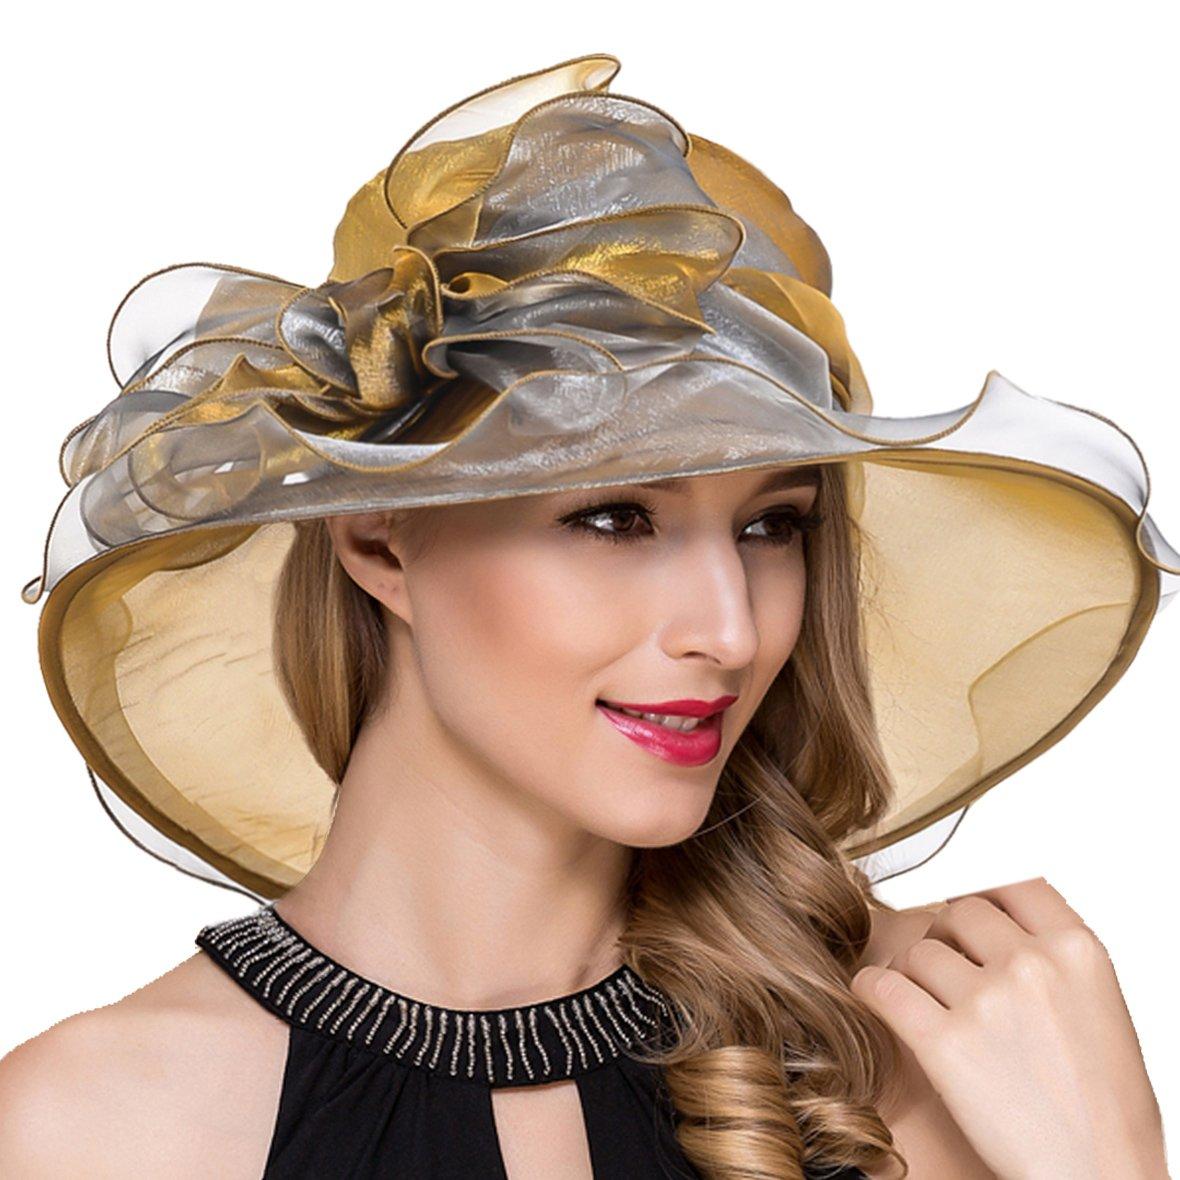 S039byellow Women Derby Church Dress Wide Brim Ruffles Tea Party Organza Hats S042b